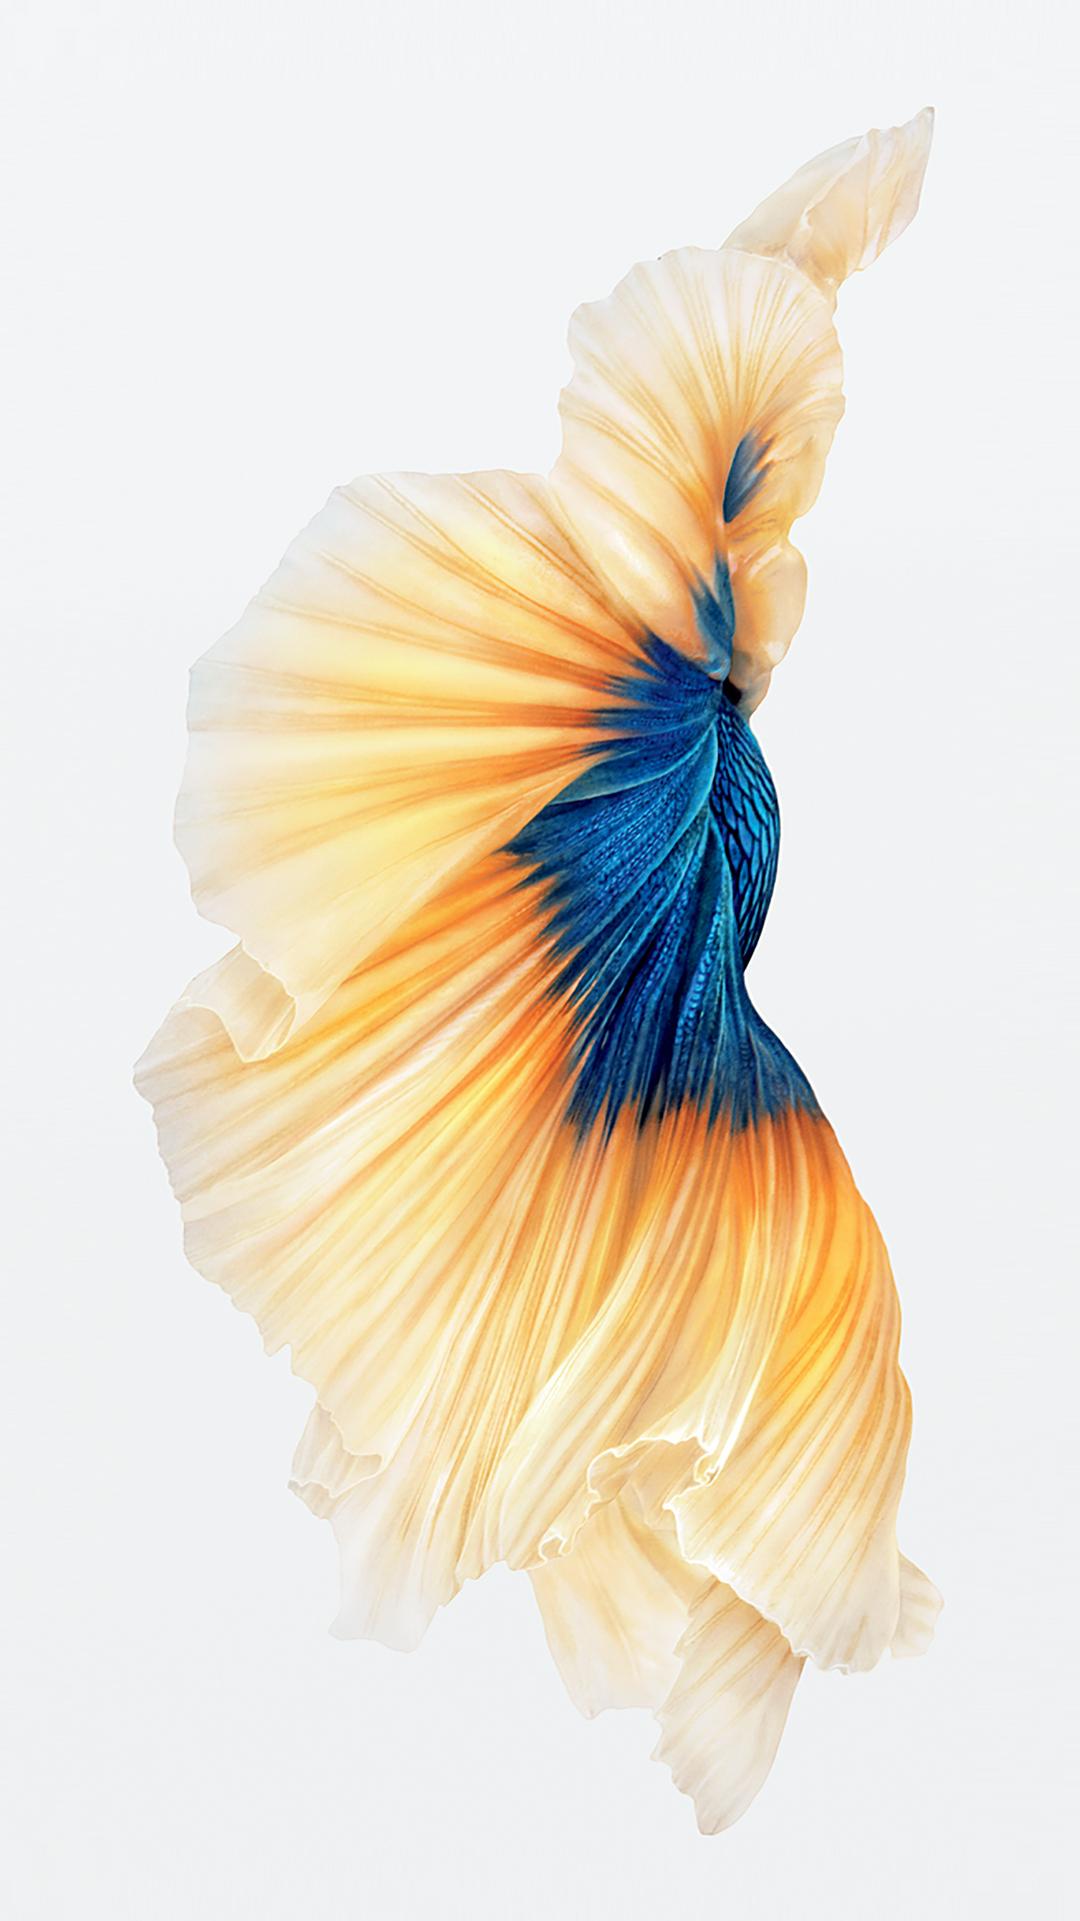 http://media.idownloadblog.com/wp-content/uploads/2015/09/iPhone-6s-Fish-Gold-Wallpaper.jpg